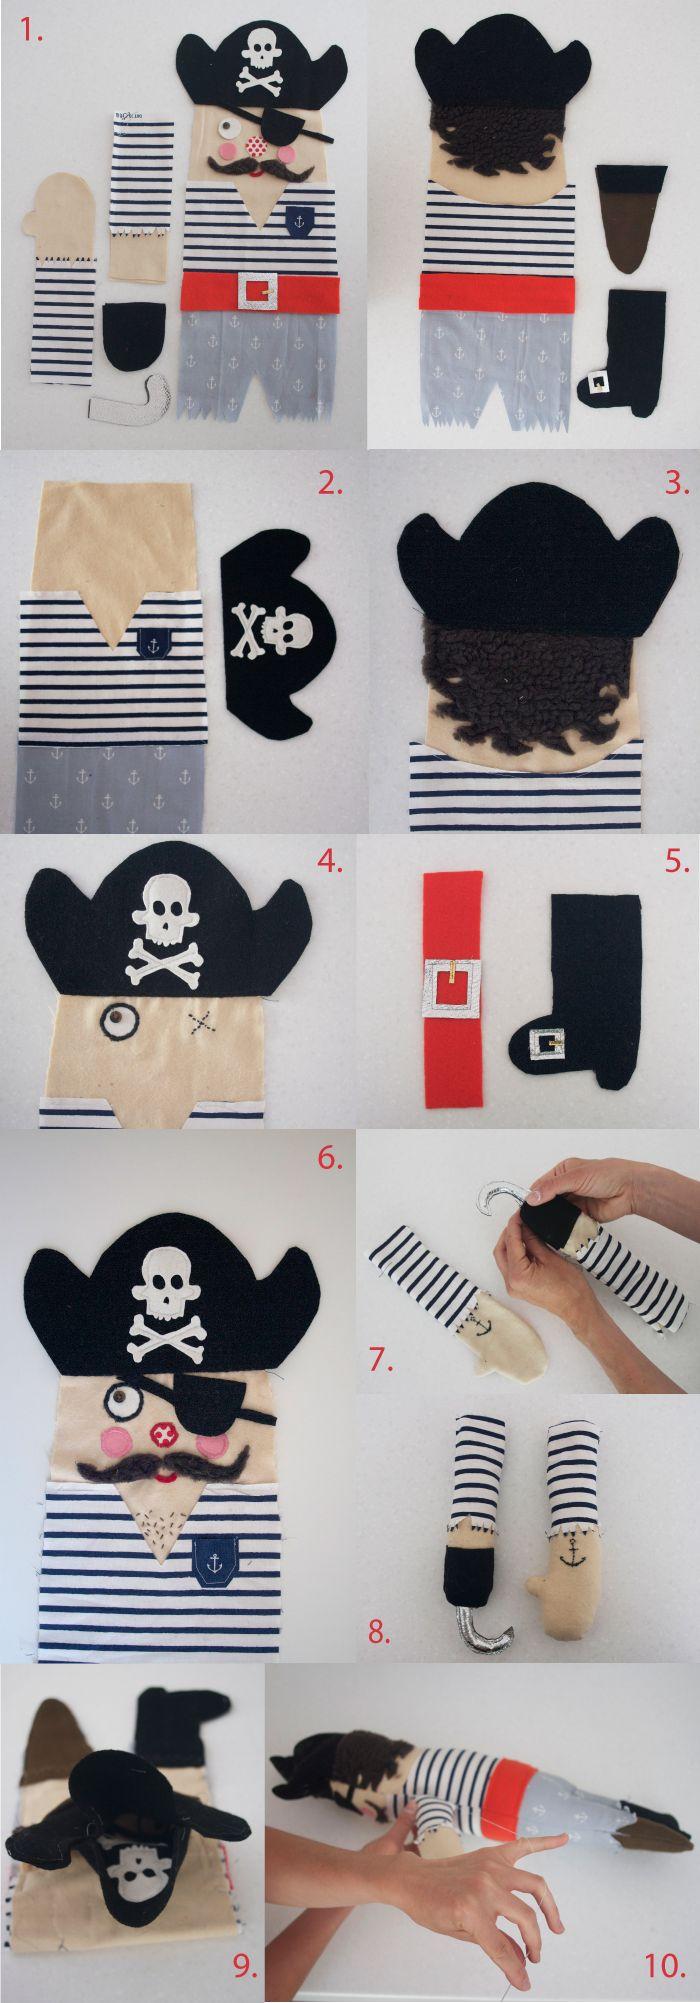 pirate doll tutorial: Dolls Crafts, Diy Pirates, Dolls Tutorials, My Boys, Children Toys, Pirates Dolls, Doll Tutorial, Dolls Patterns, Pirate Dolls